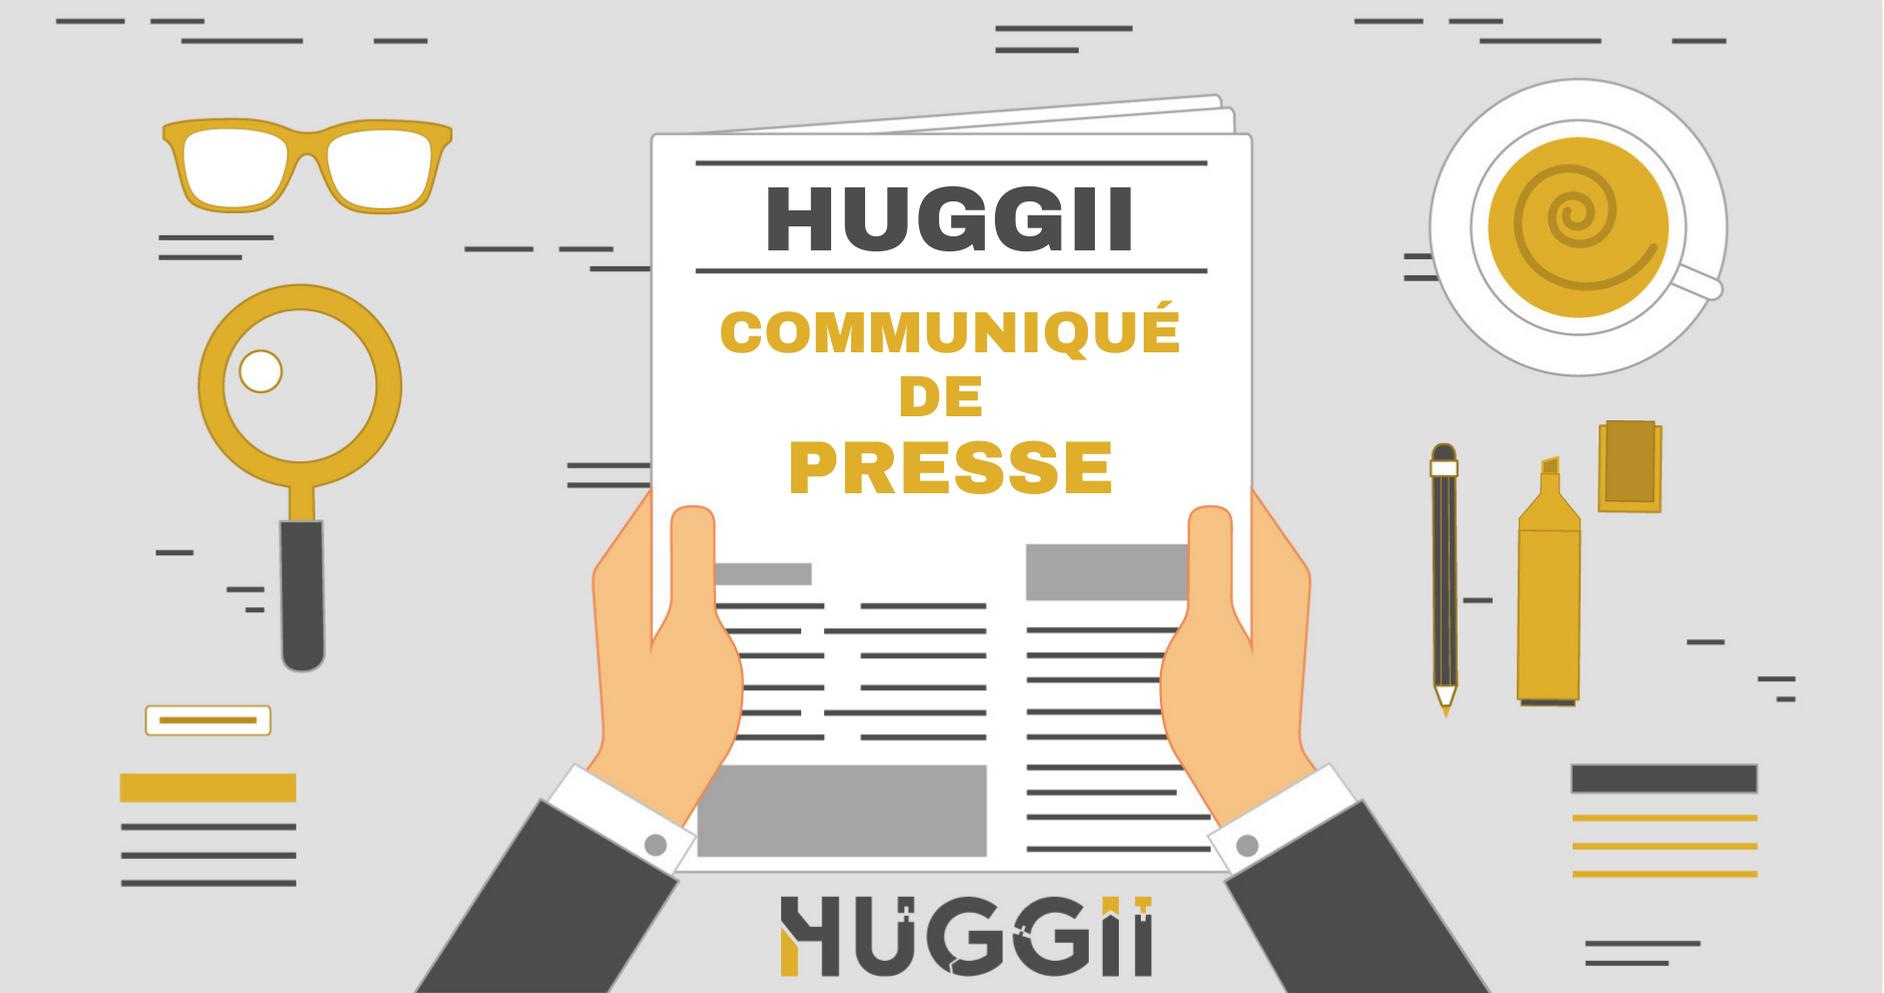 Communiqué de Presse Huggii